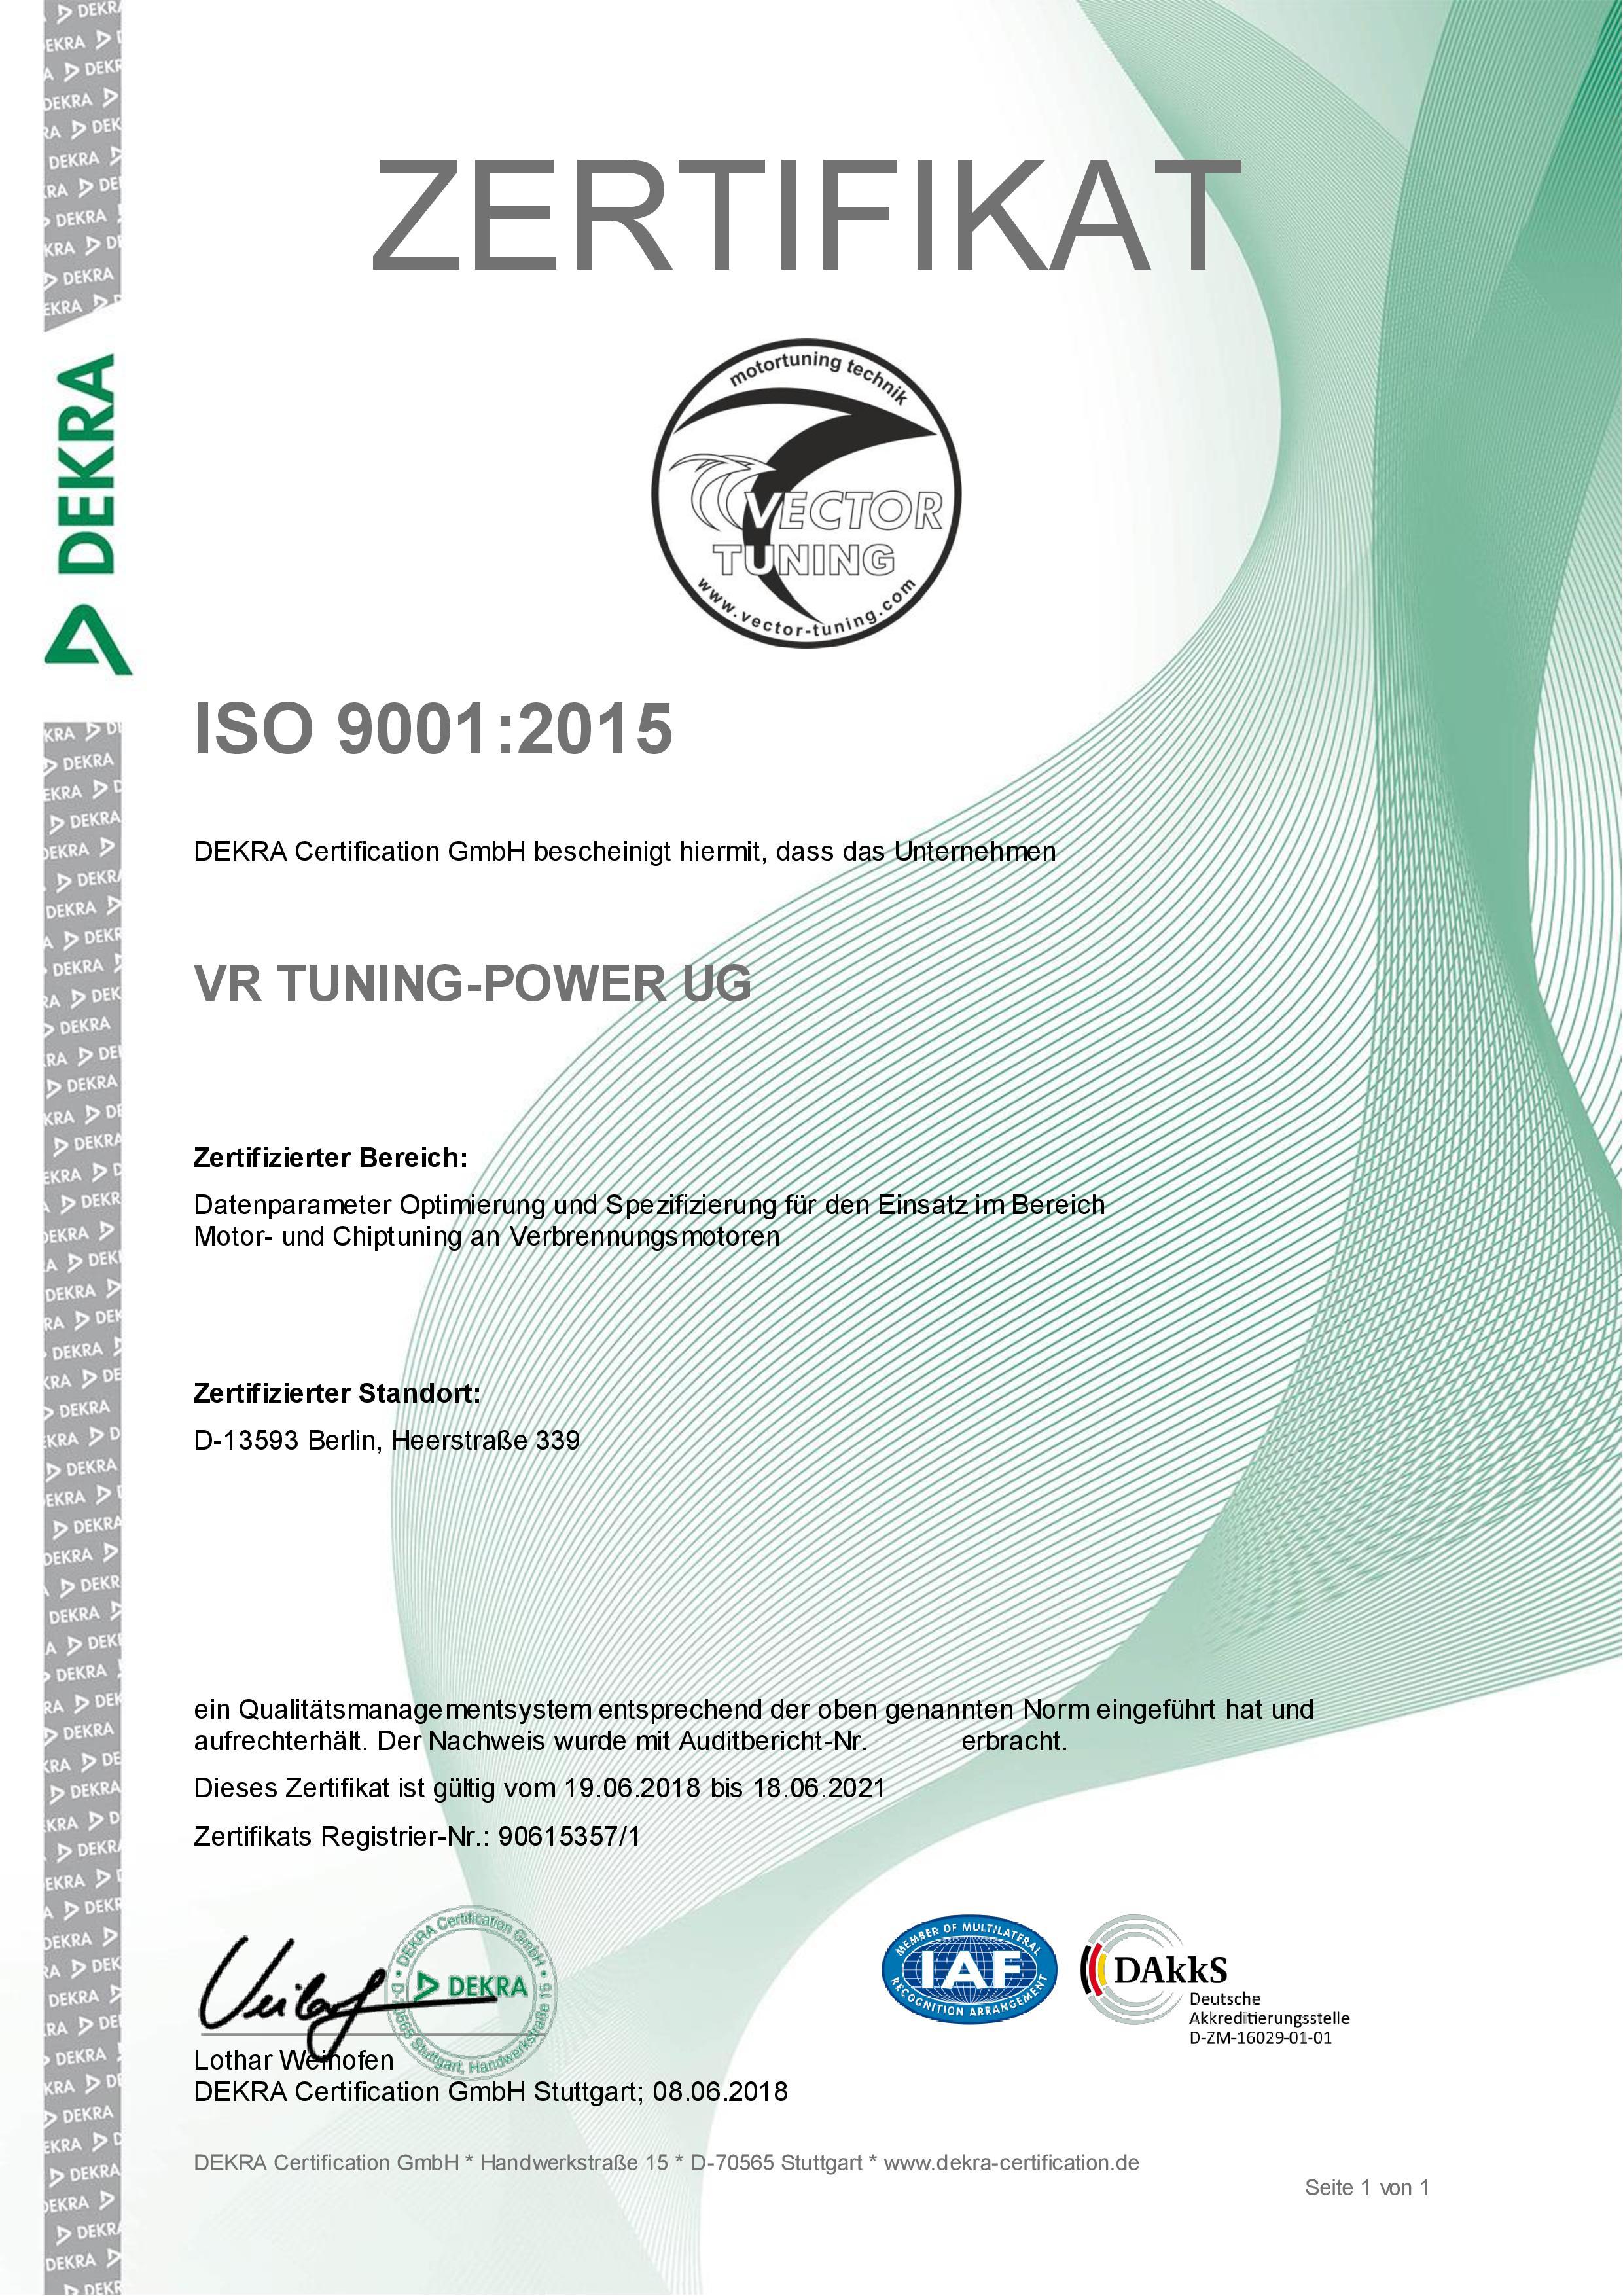 DEKRA Certificate ISO 9001